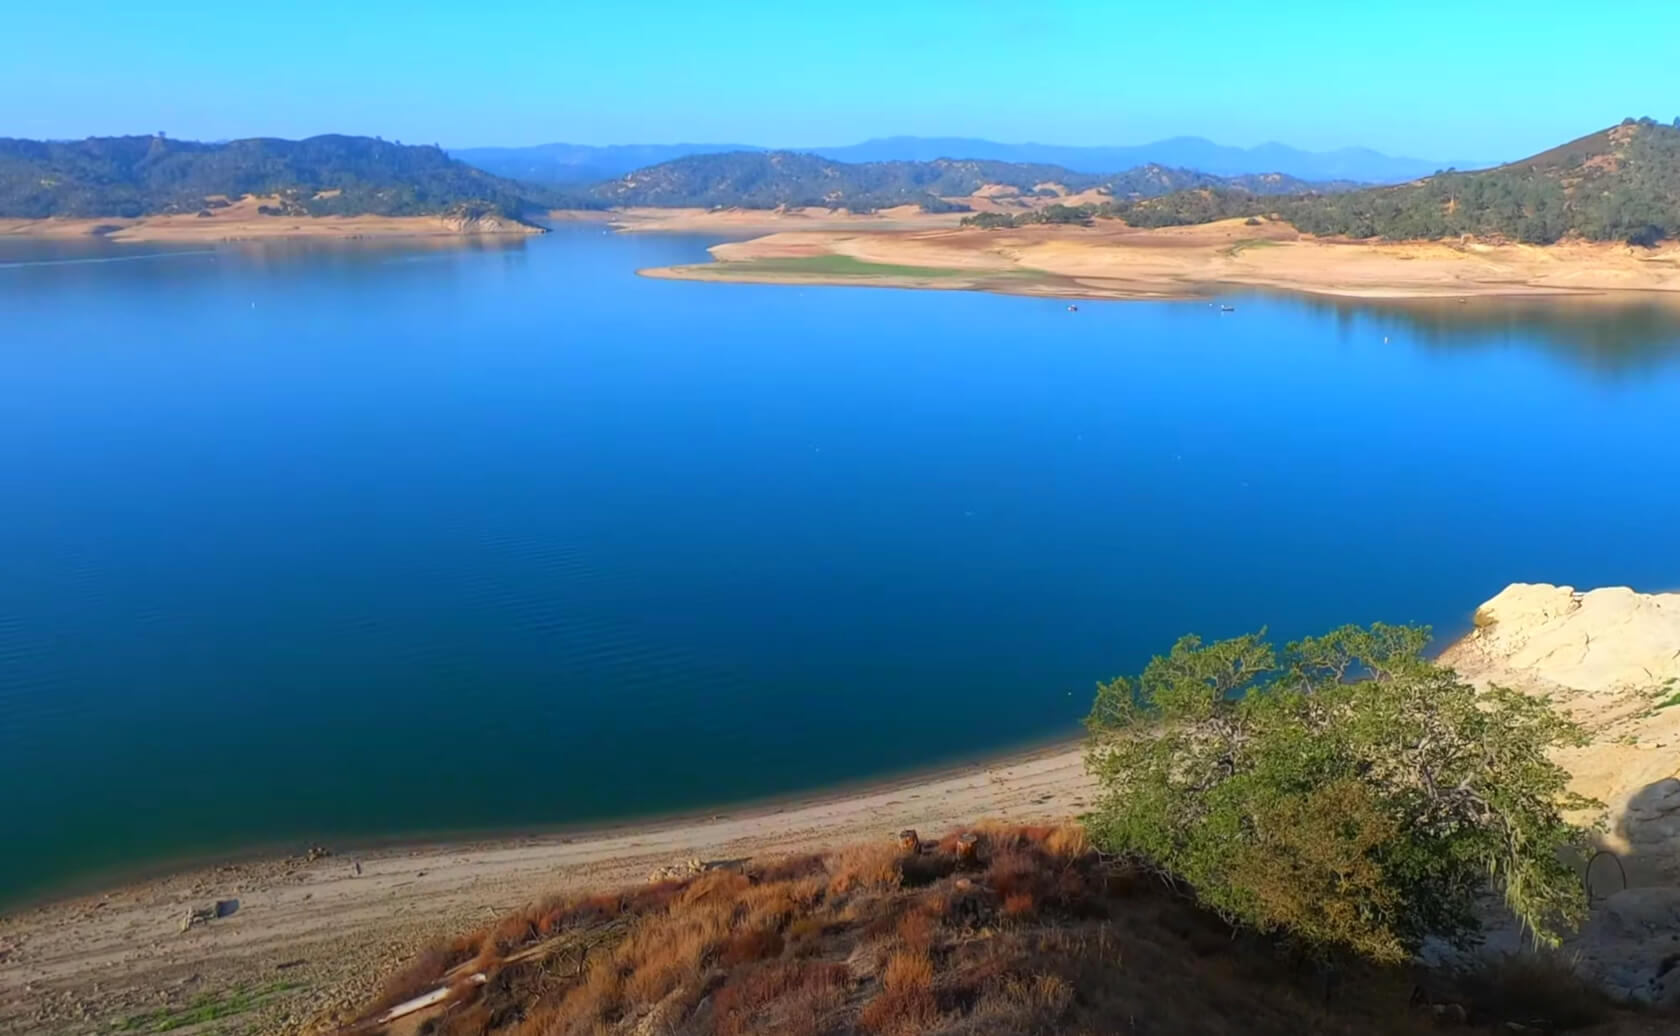 Nacimiento-Lake-Fishing-Guide-Report-California-08